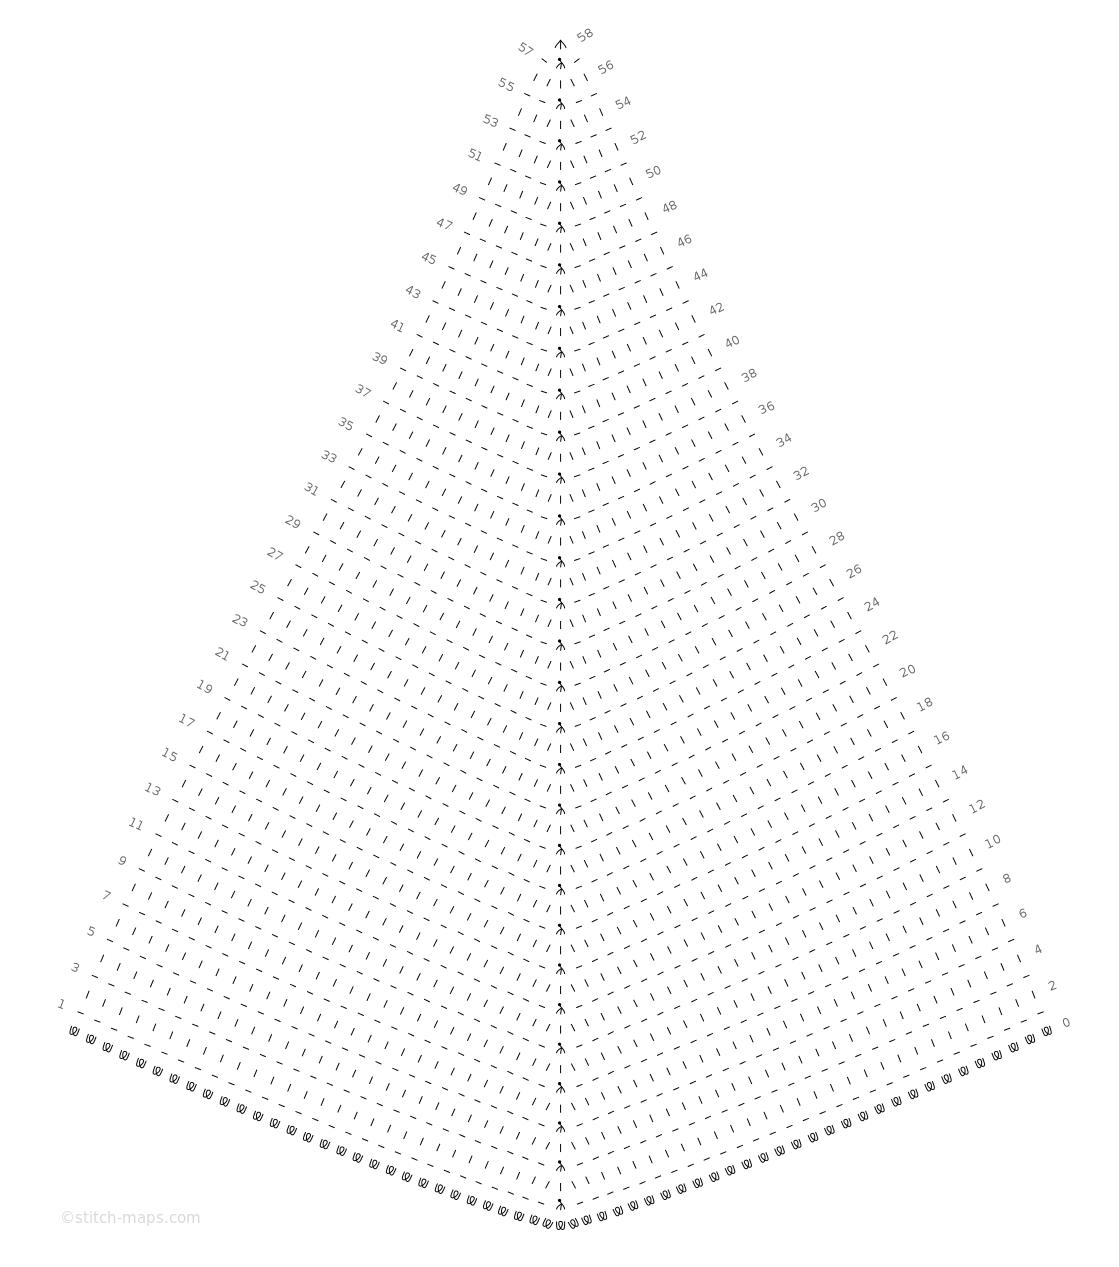 1_sq chart